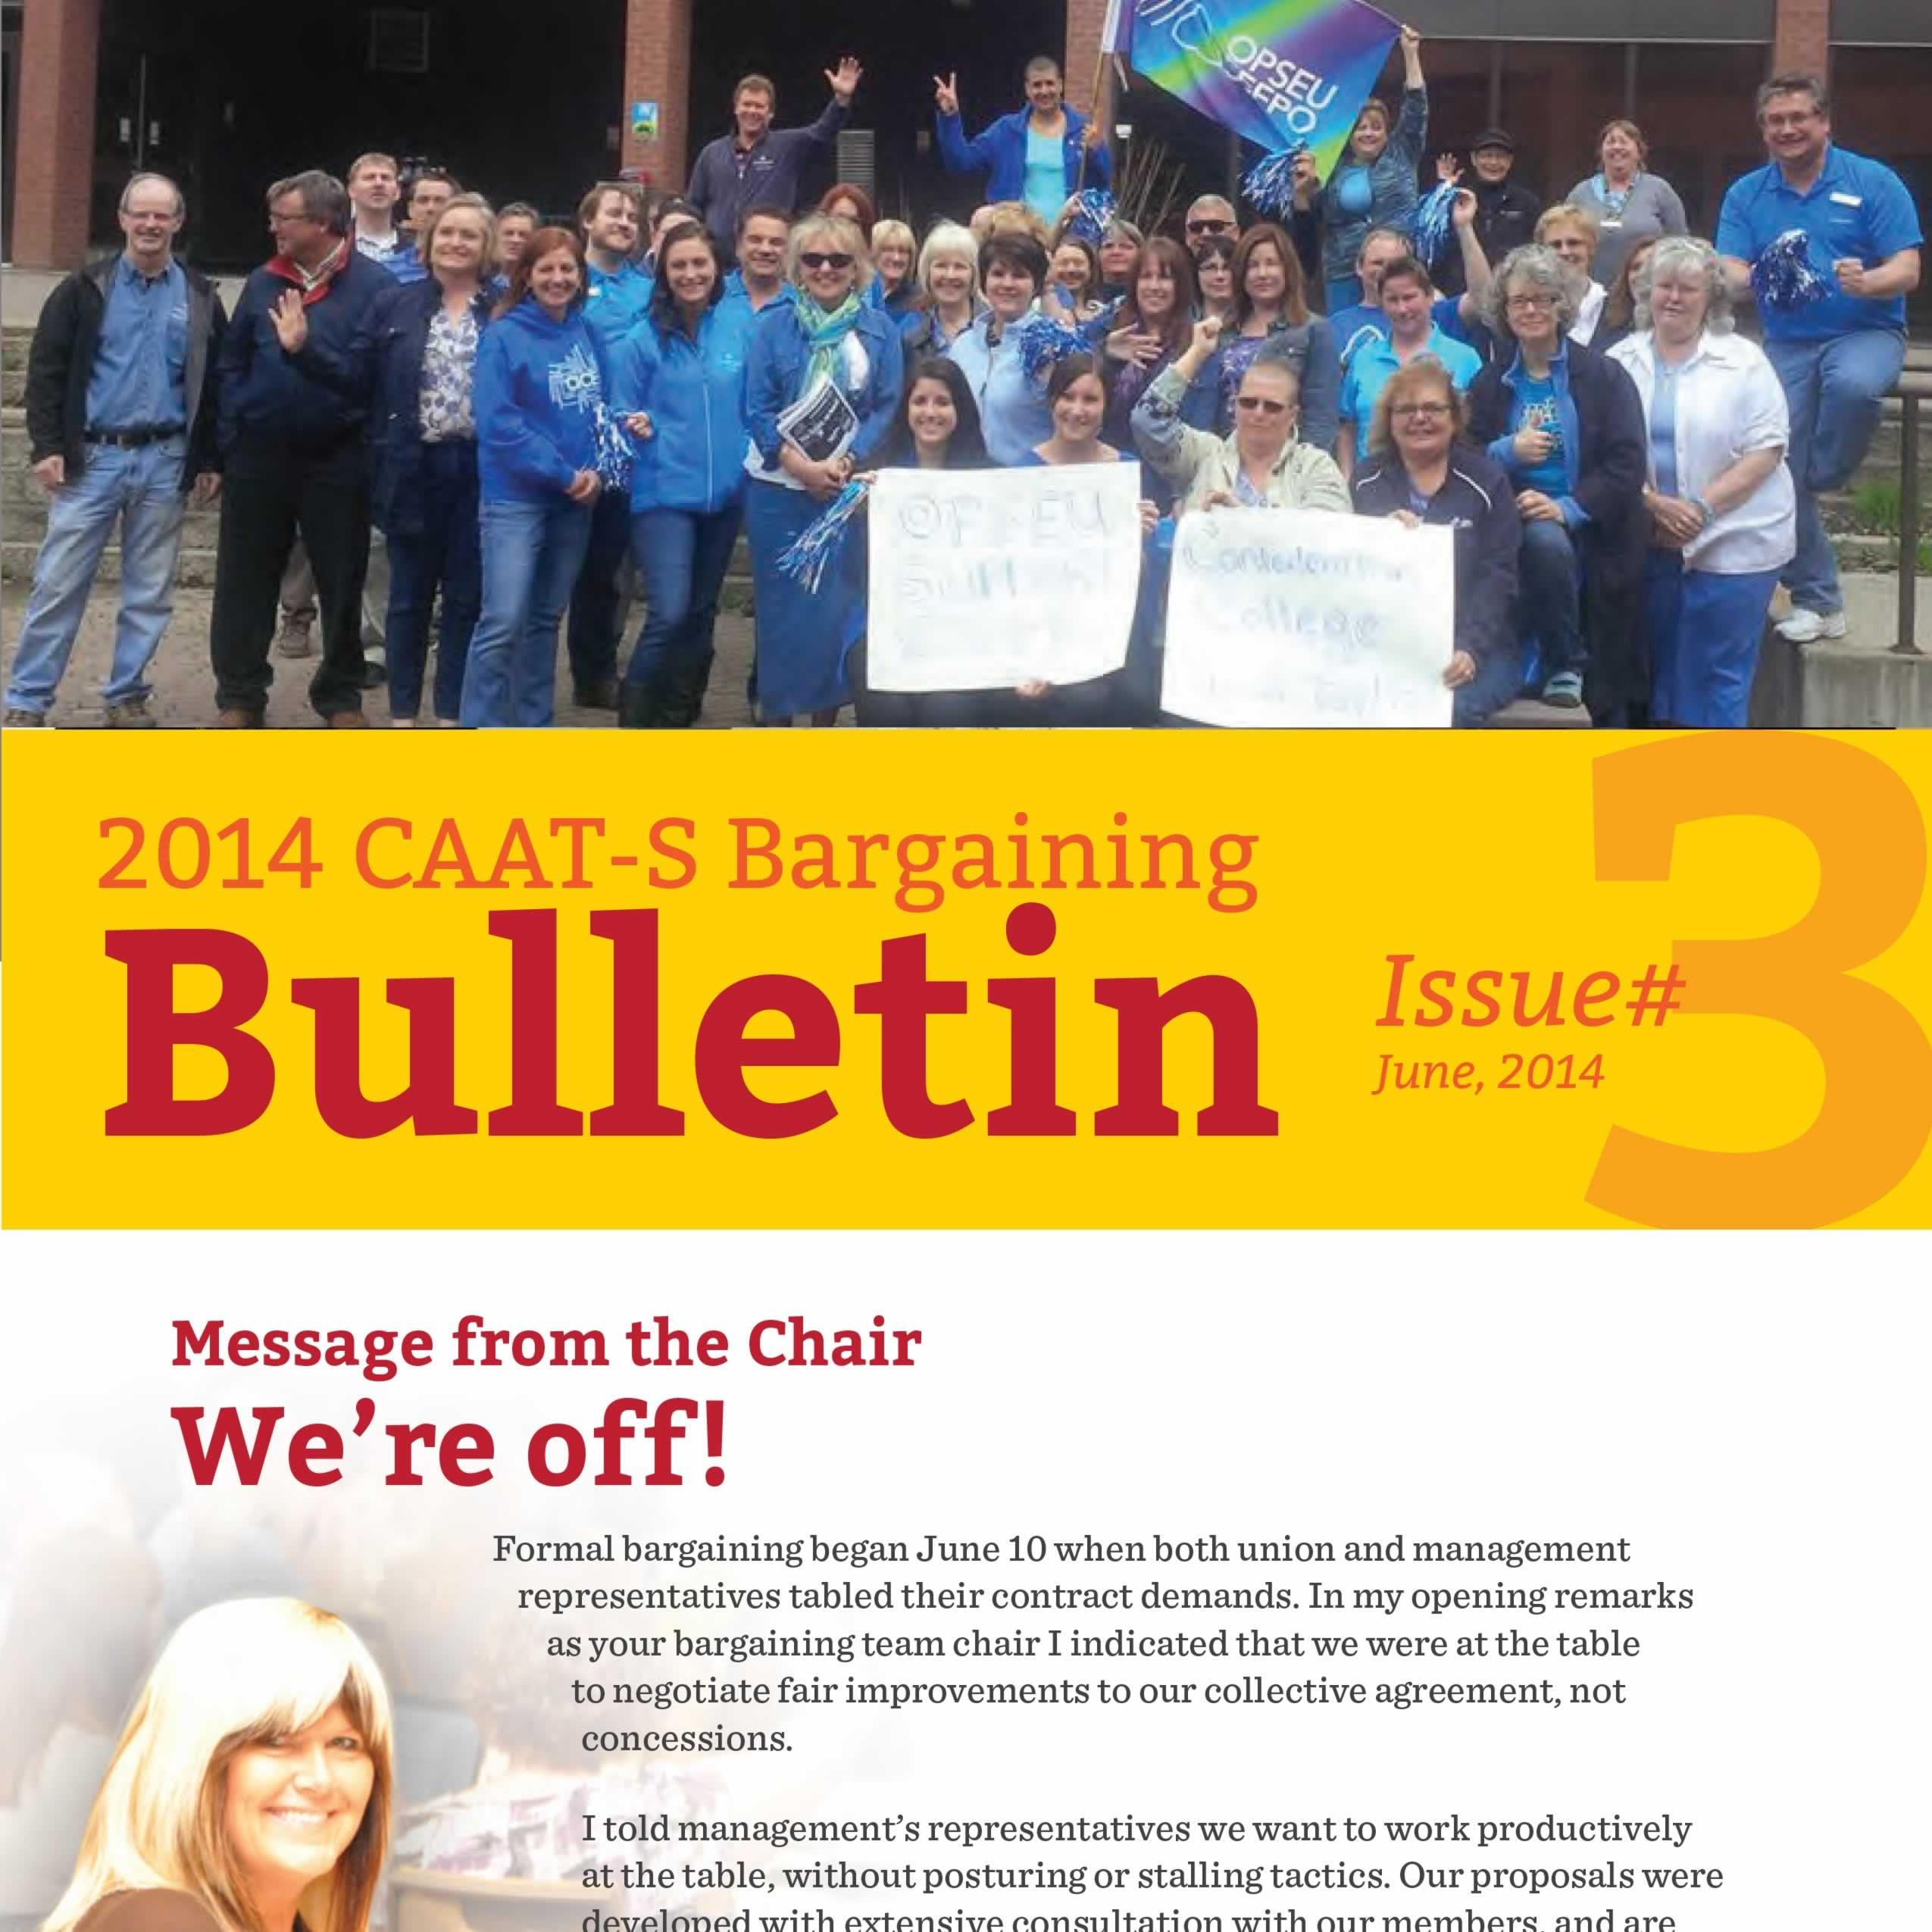 2014 CAAT-S Bargaining Bulletin Issue 3